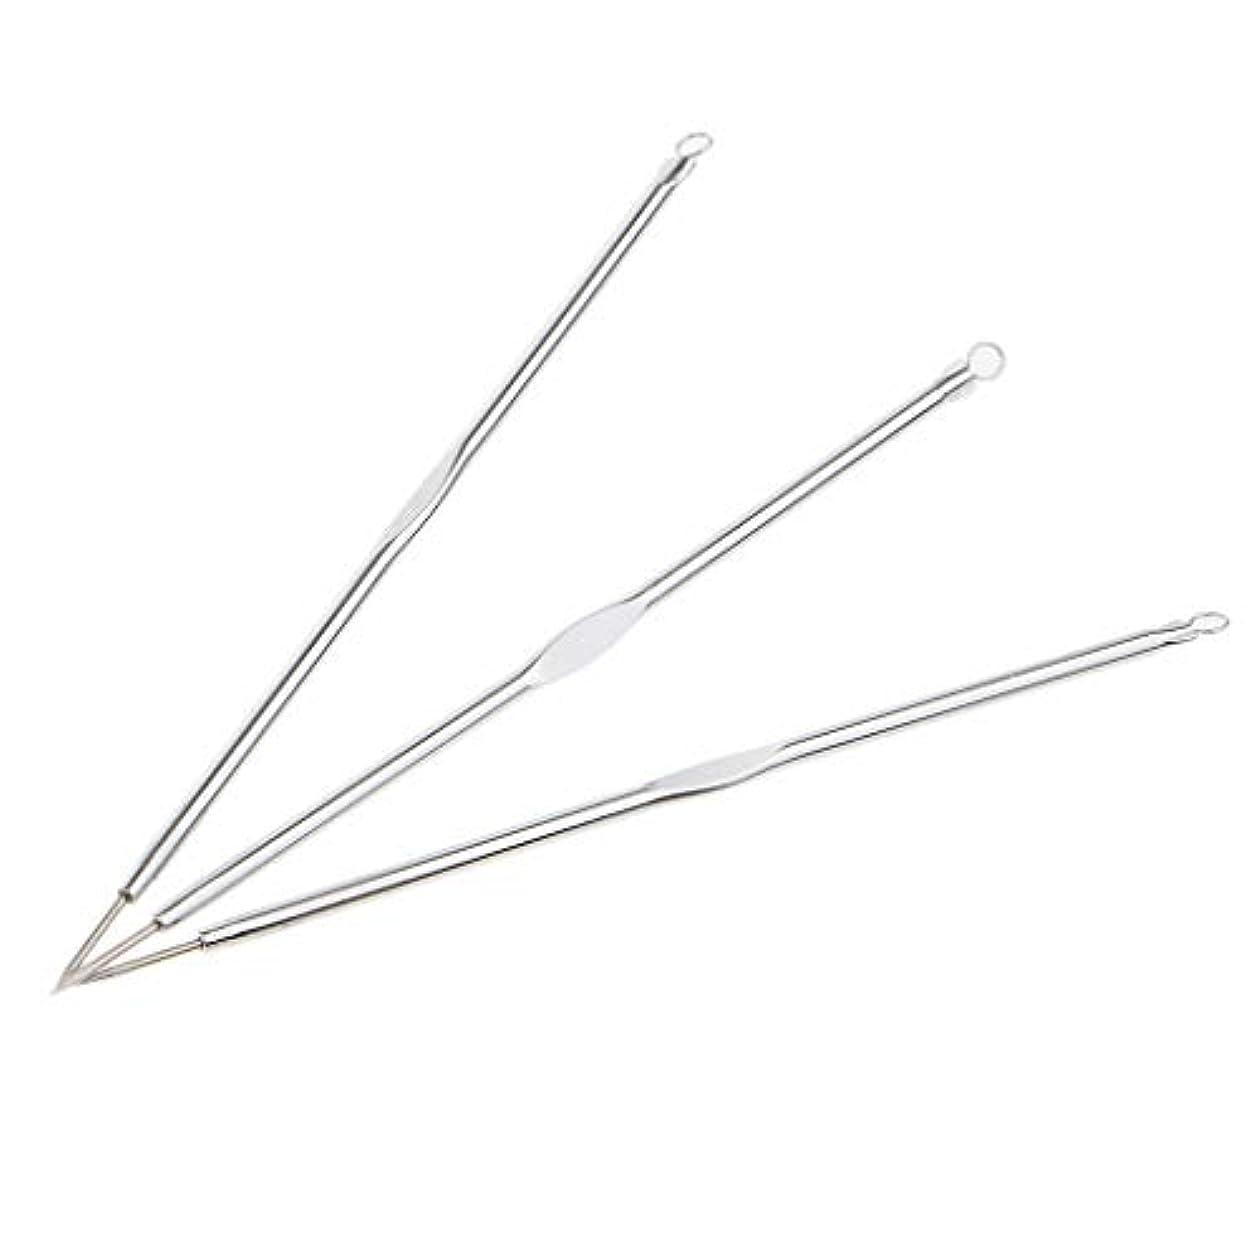 DYNWAVE 黒ずみリムーバー ニキビ針 ニードル ニキビ針 リムーバーツール メイク道具 3個入り